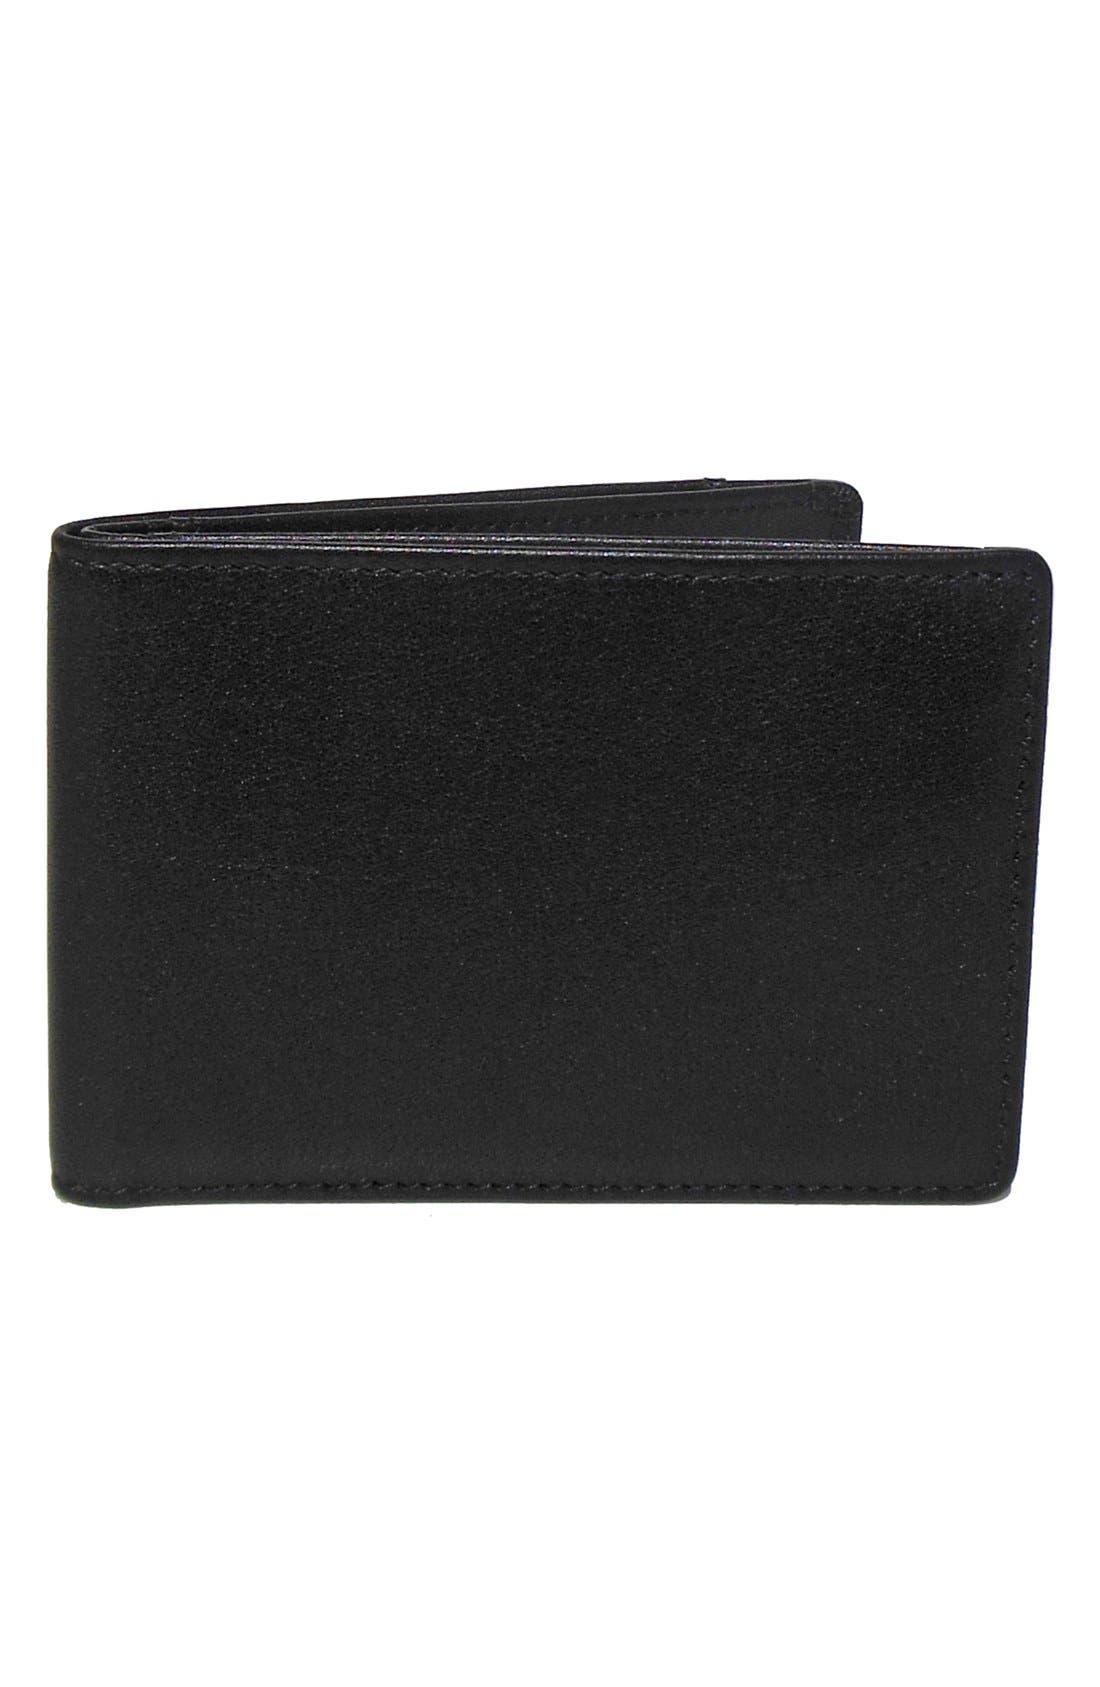 'Grant Slimster' RFID Blocker Leather Wallet,                             Main thumbnail 1, color,                             Black/ Grey